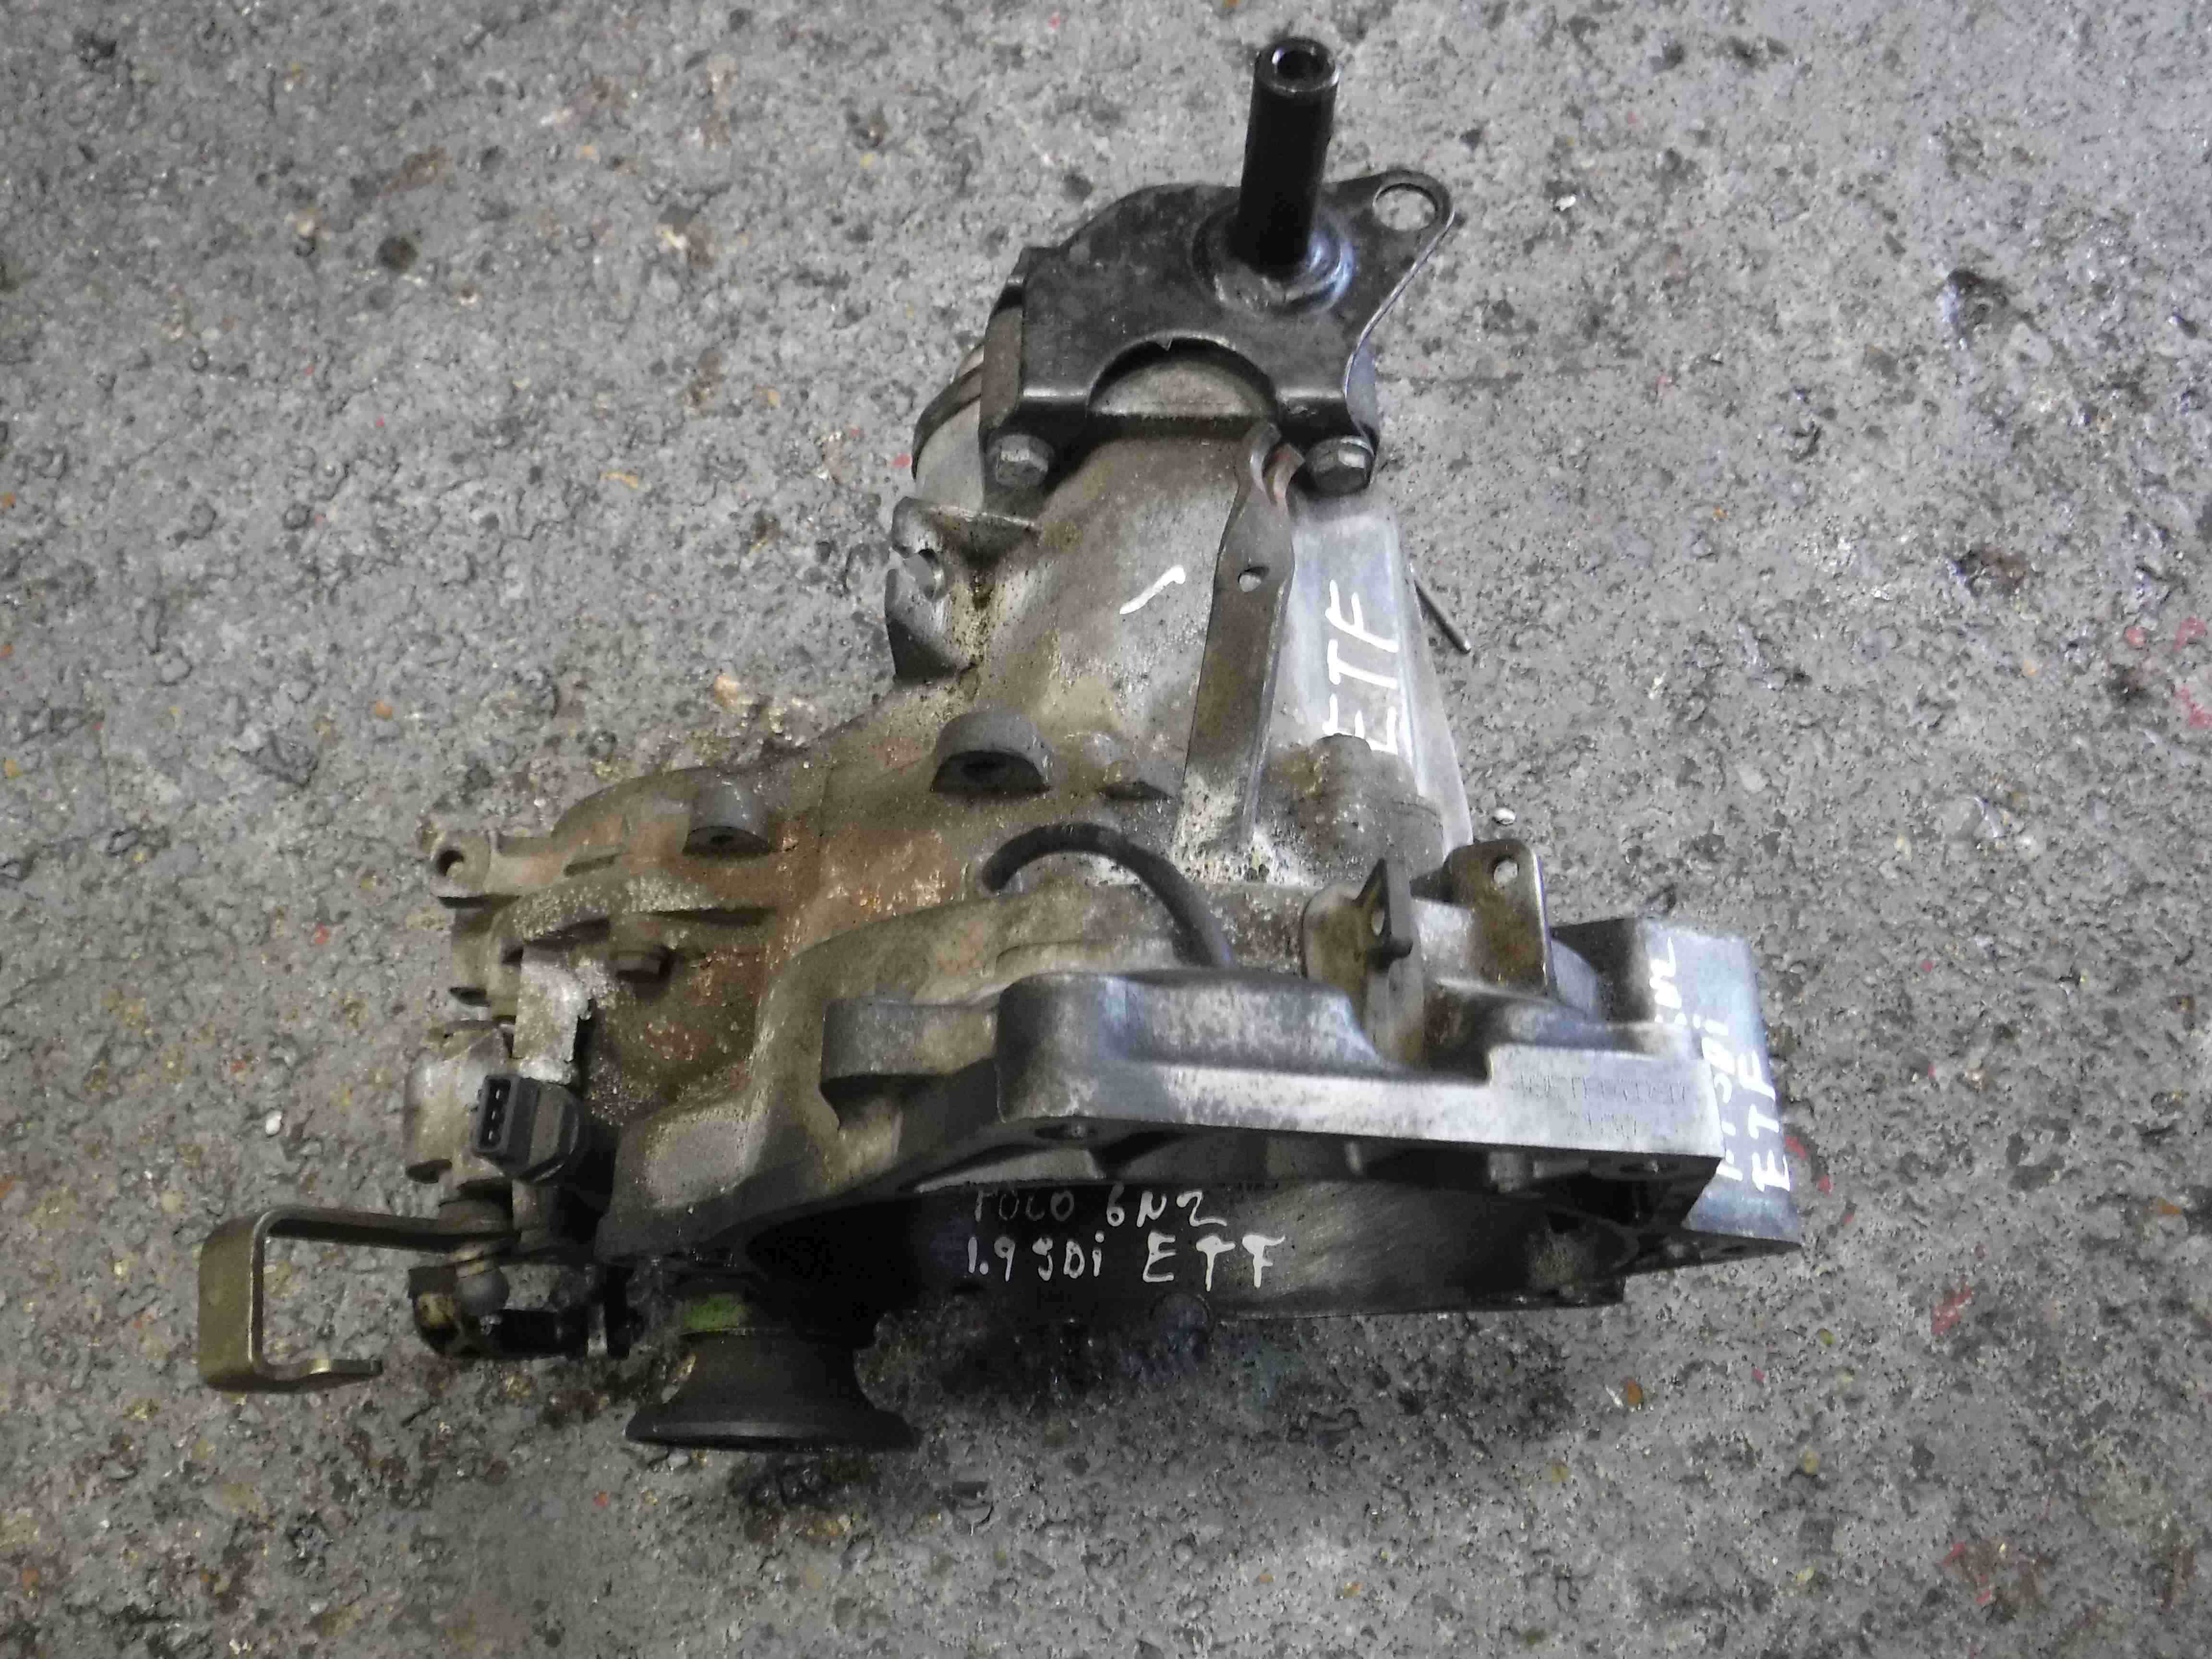 Volkswagen Polo 1999-2003 6N2 1.9 SDi Gearbox ETF